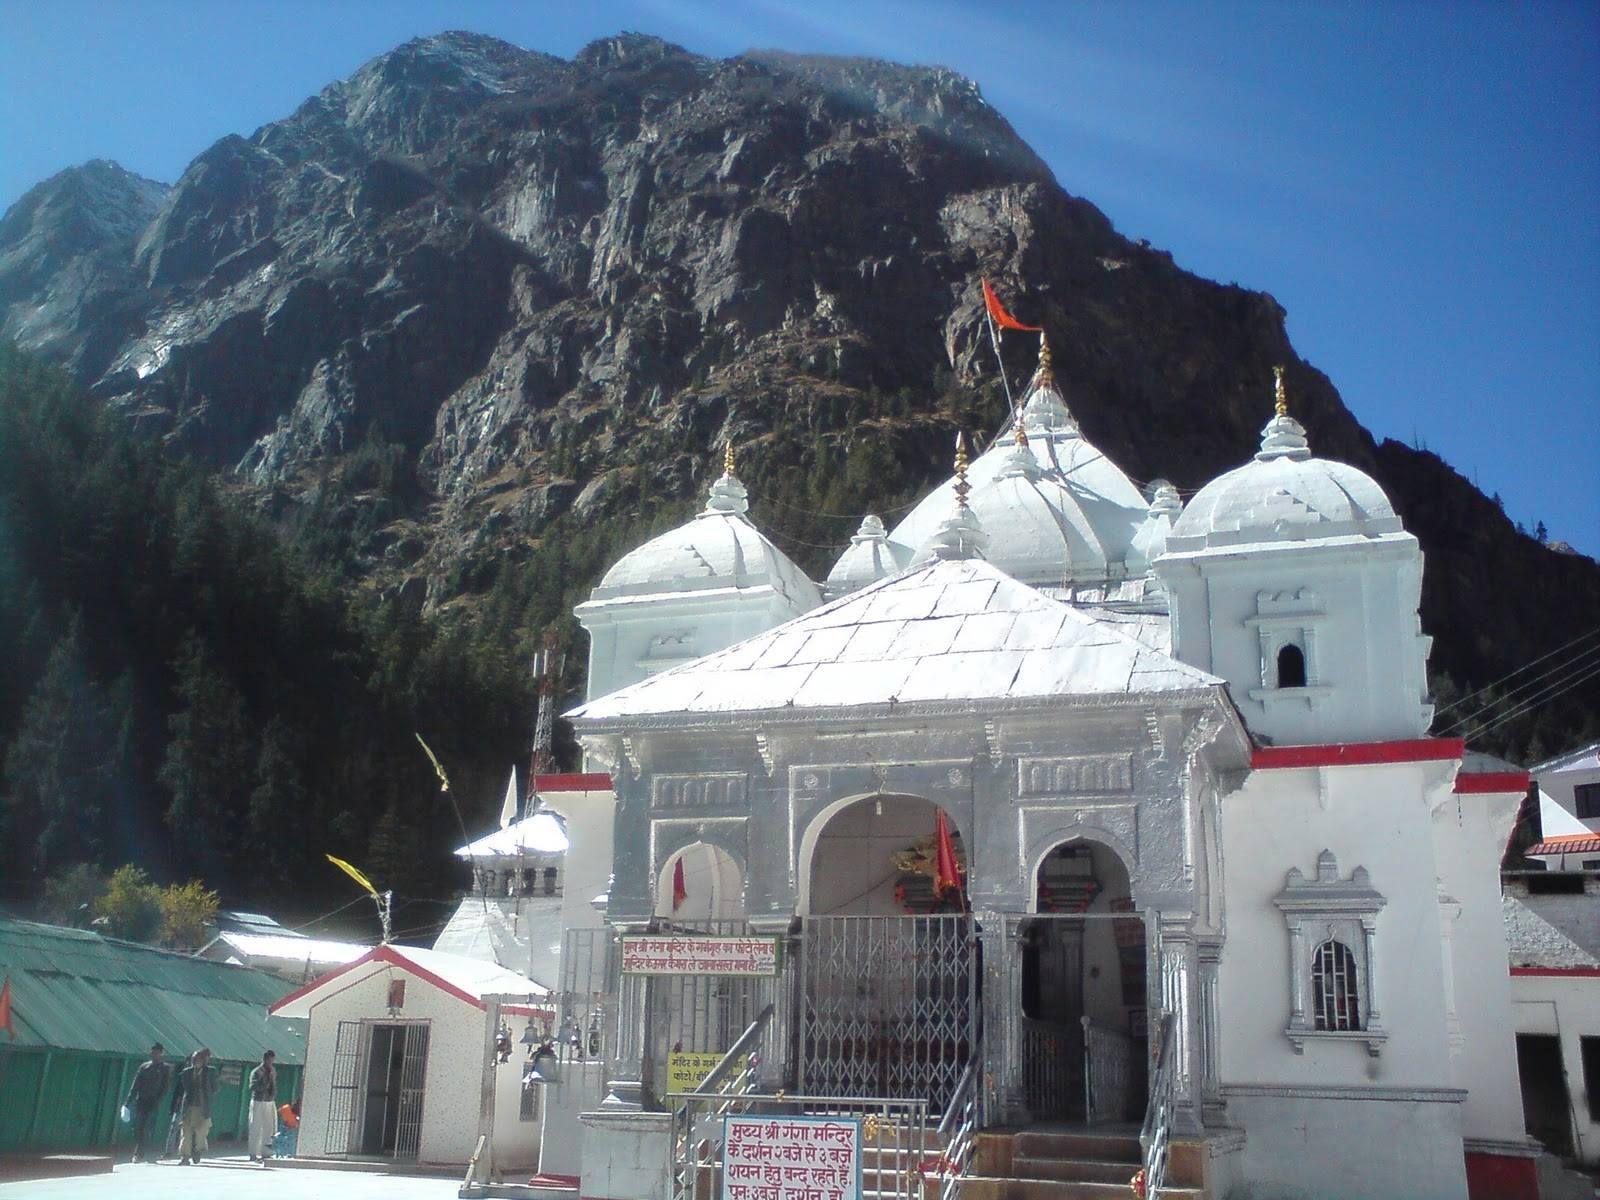 gangotri temple dayara bugyal trek